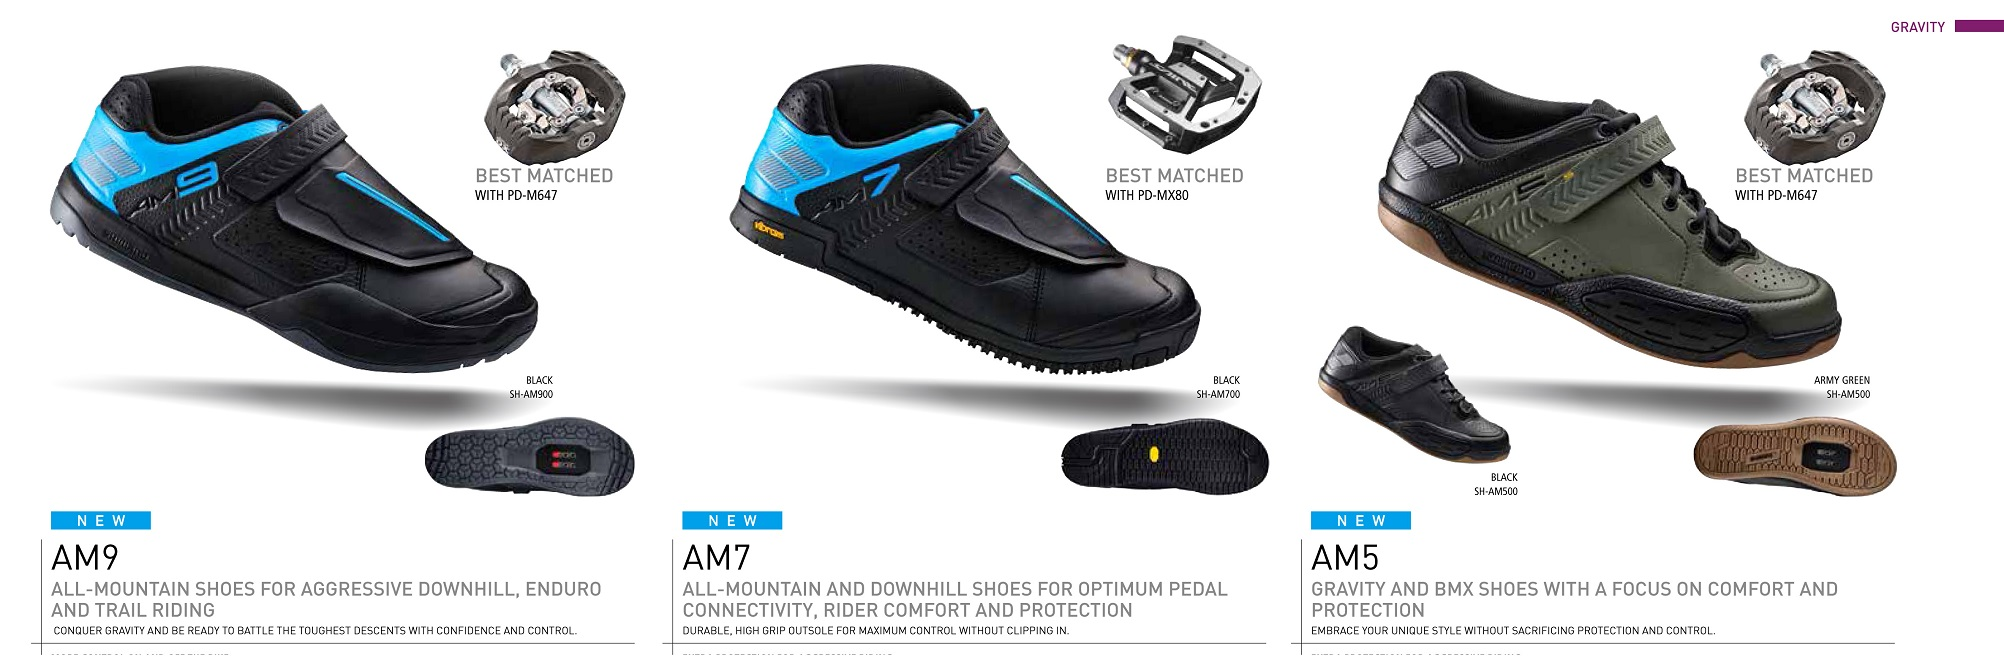 Shimano Atb Shoe Review